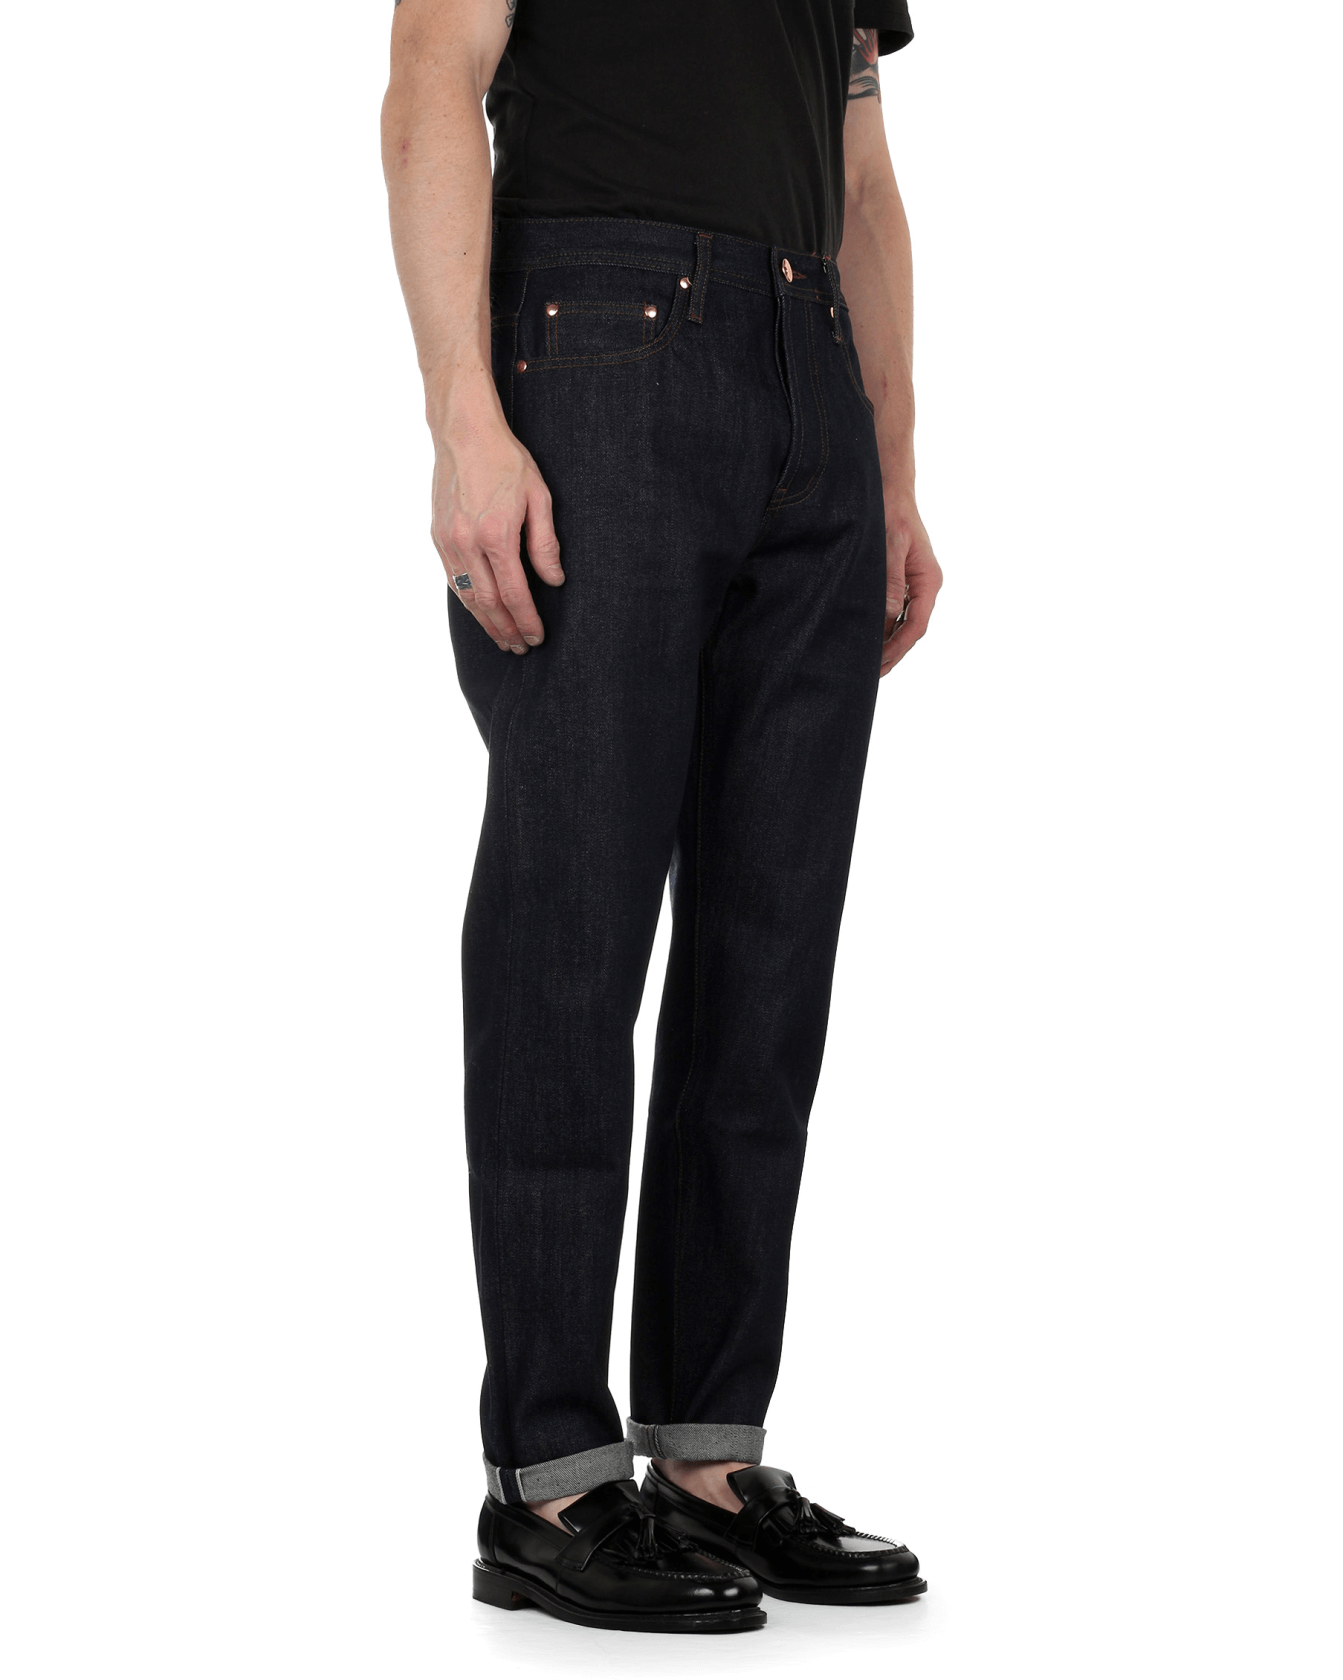 14.5oz Indigo Selvedge Unbranded UB601 Relaxed Tapered Mens Jeans